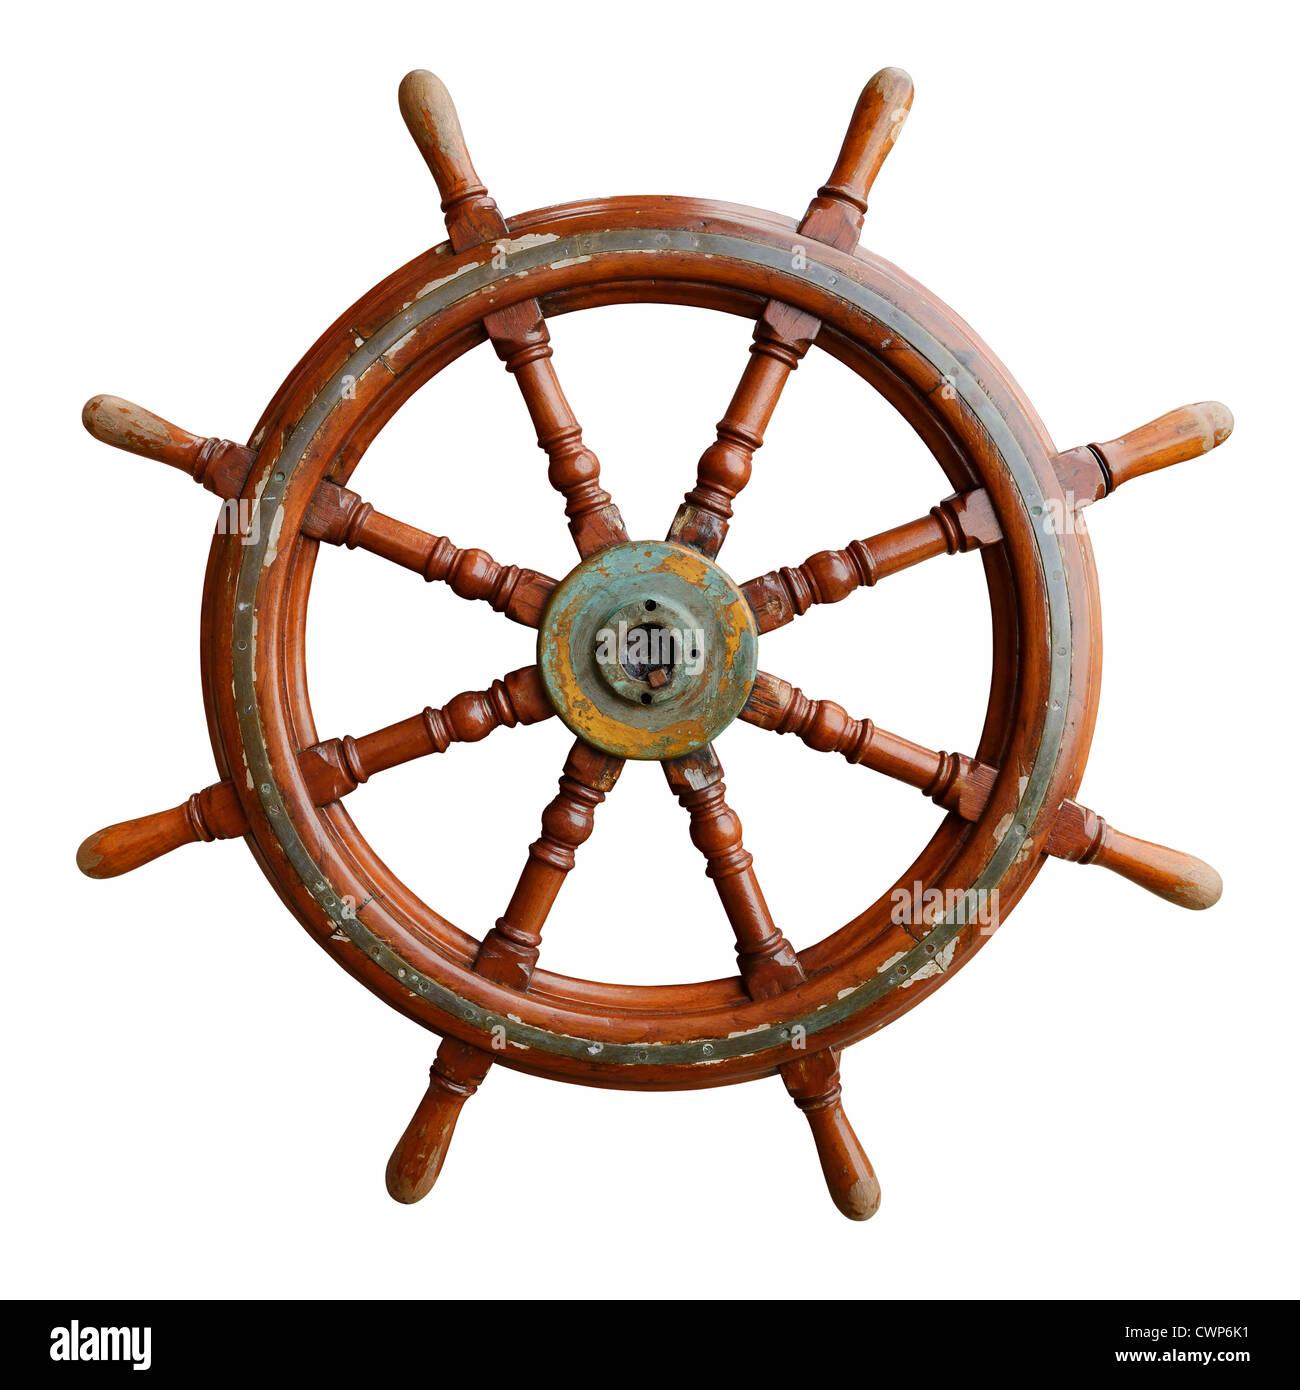 Ships wheel - Stock Image